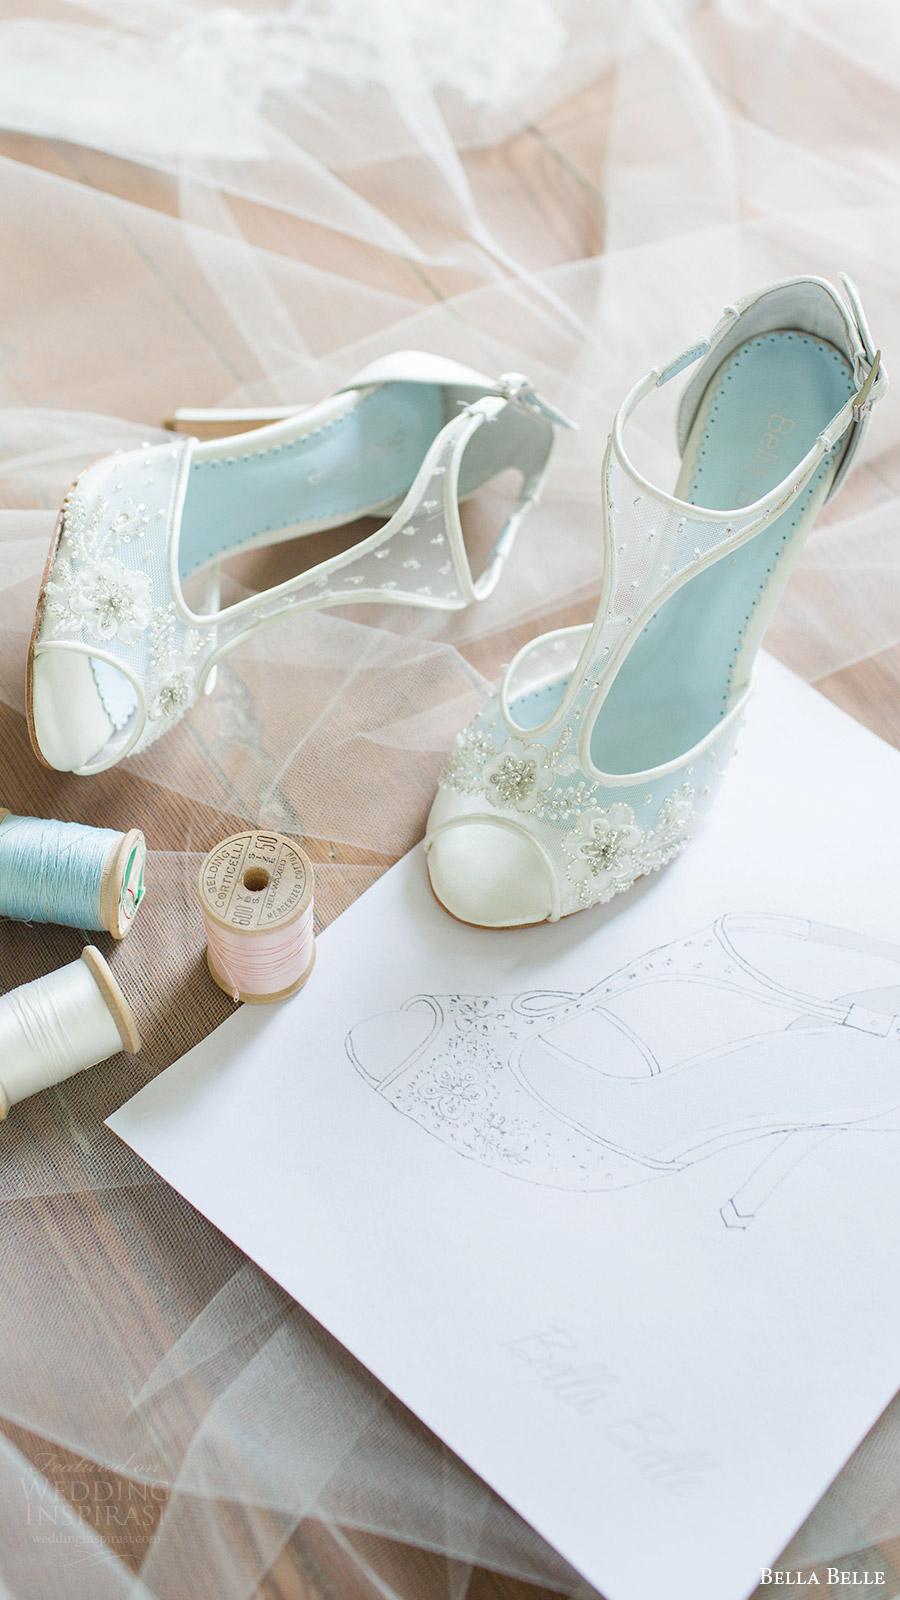 bella belle bridal shoes 2016 paloma peep toe t strap heels